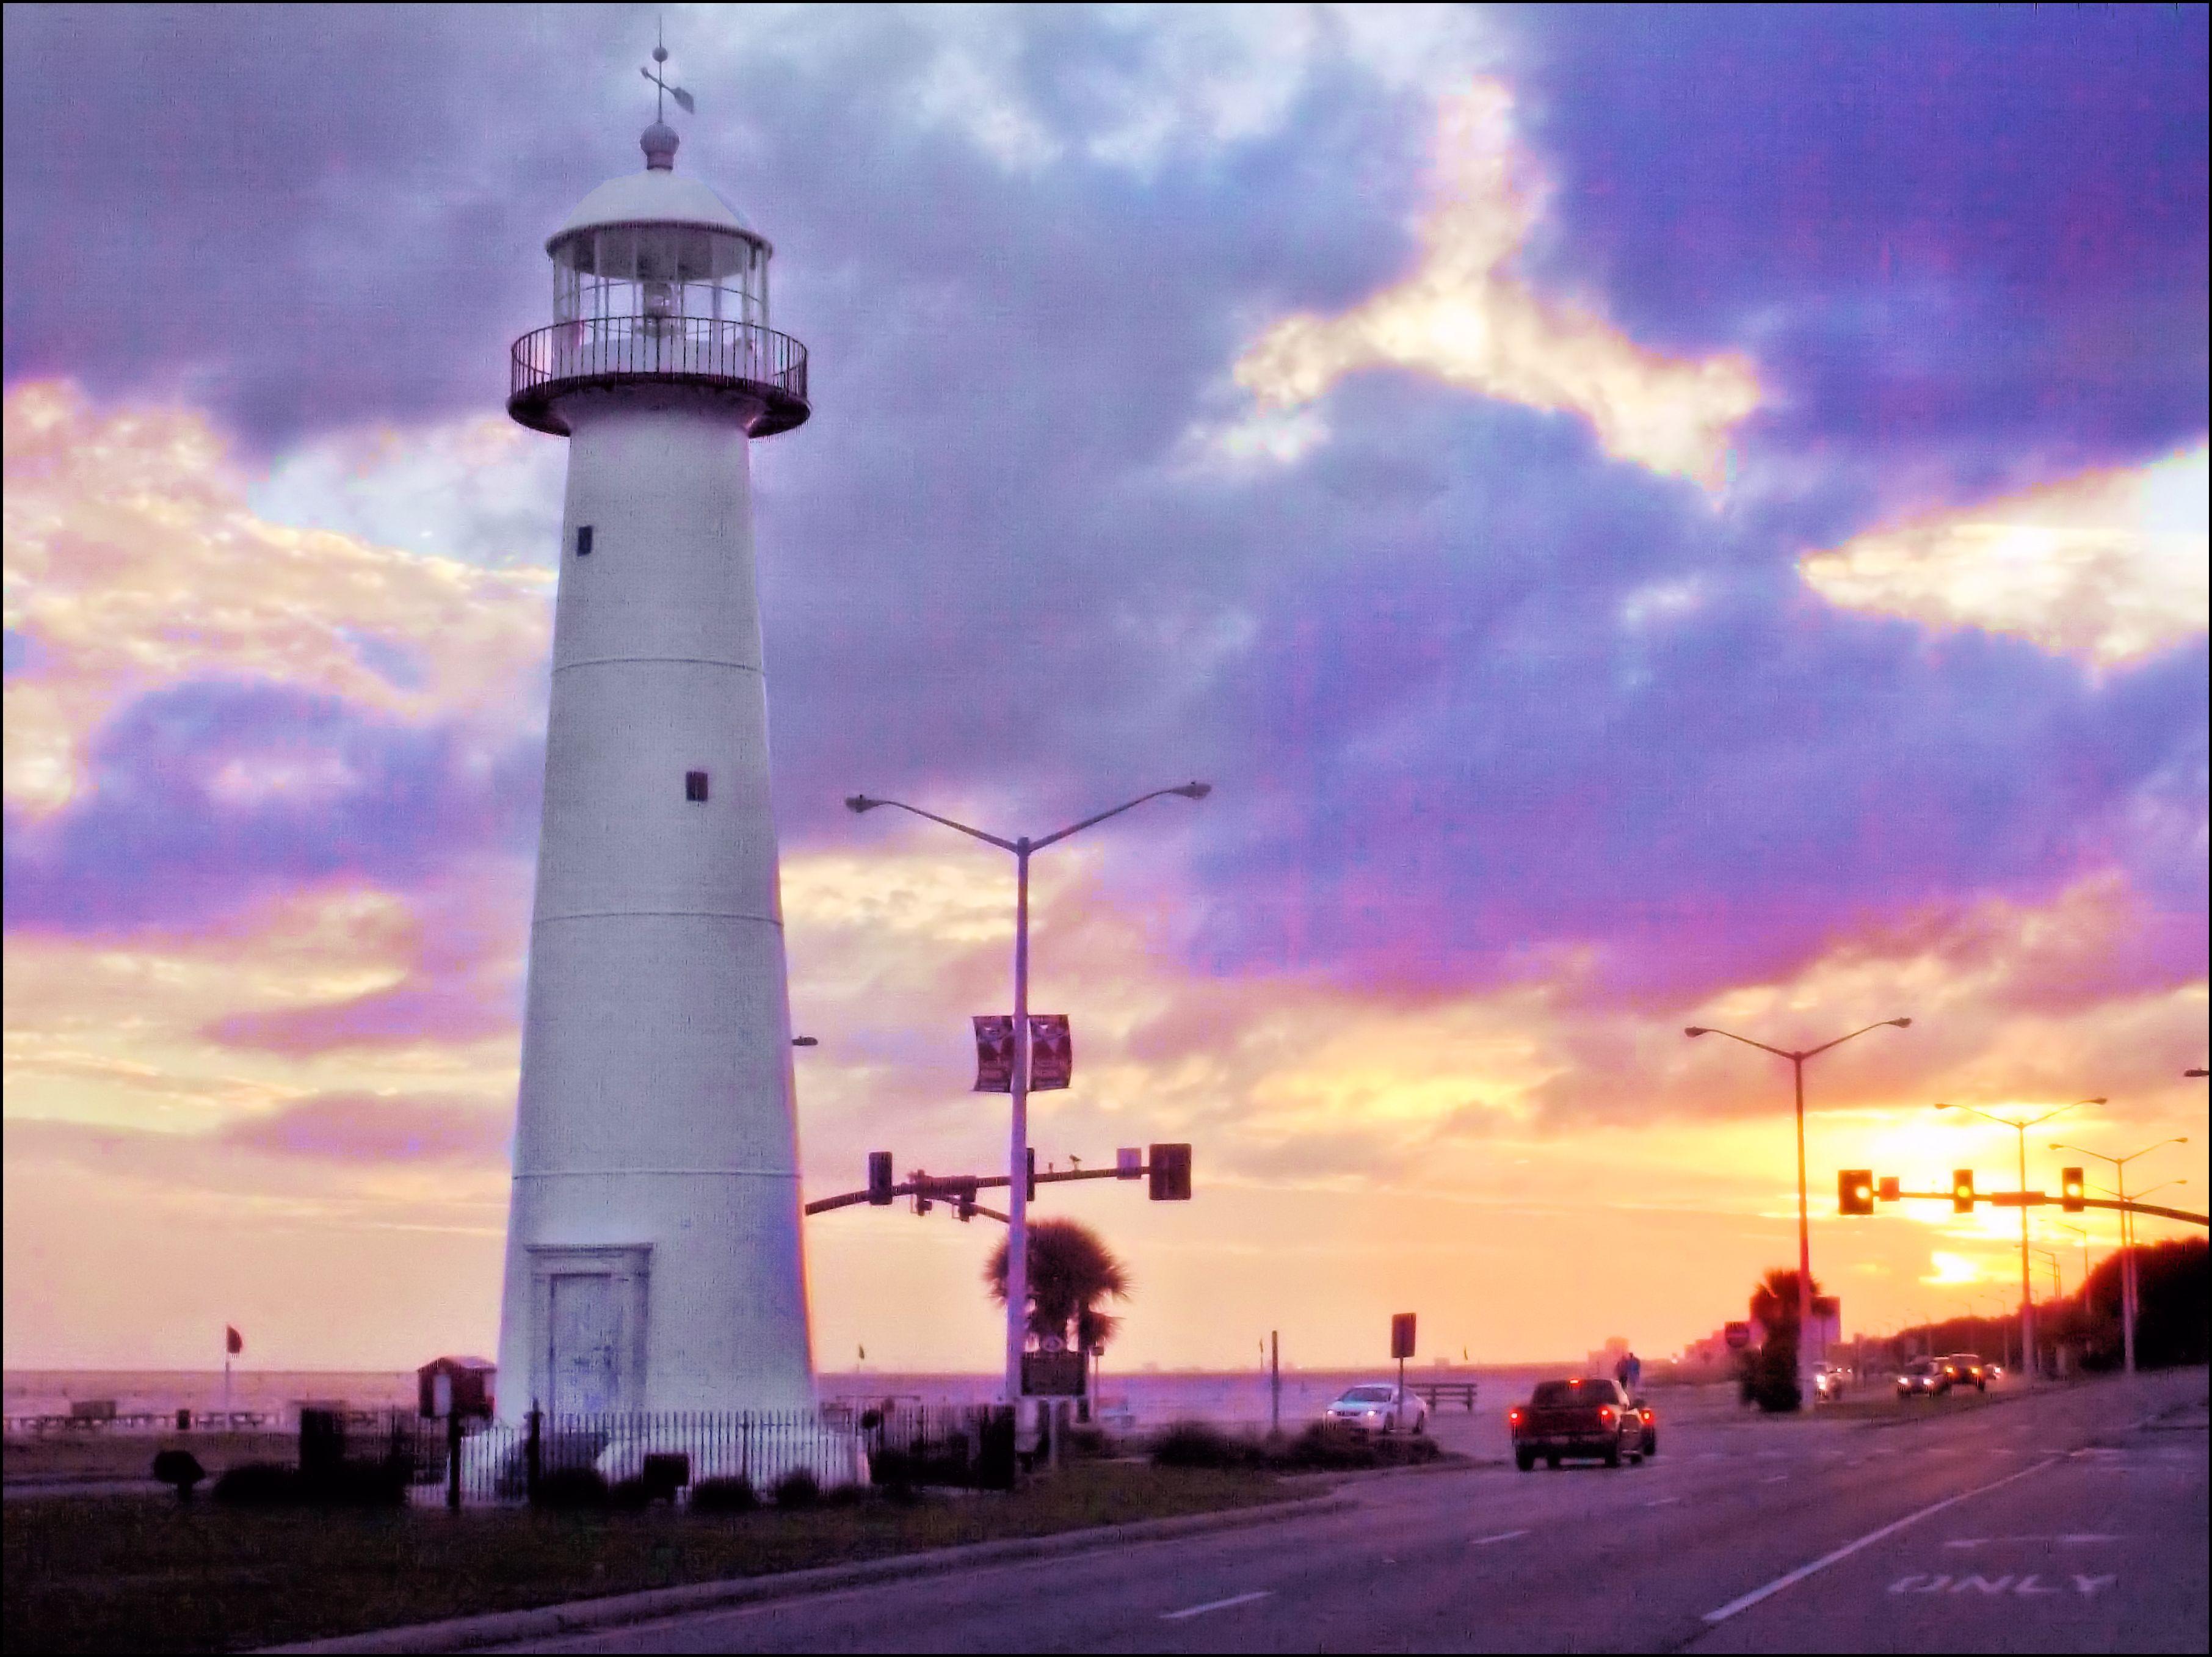 John Lee Rd Biloxi Ms Usa Sunrise Sunset Times